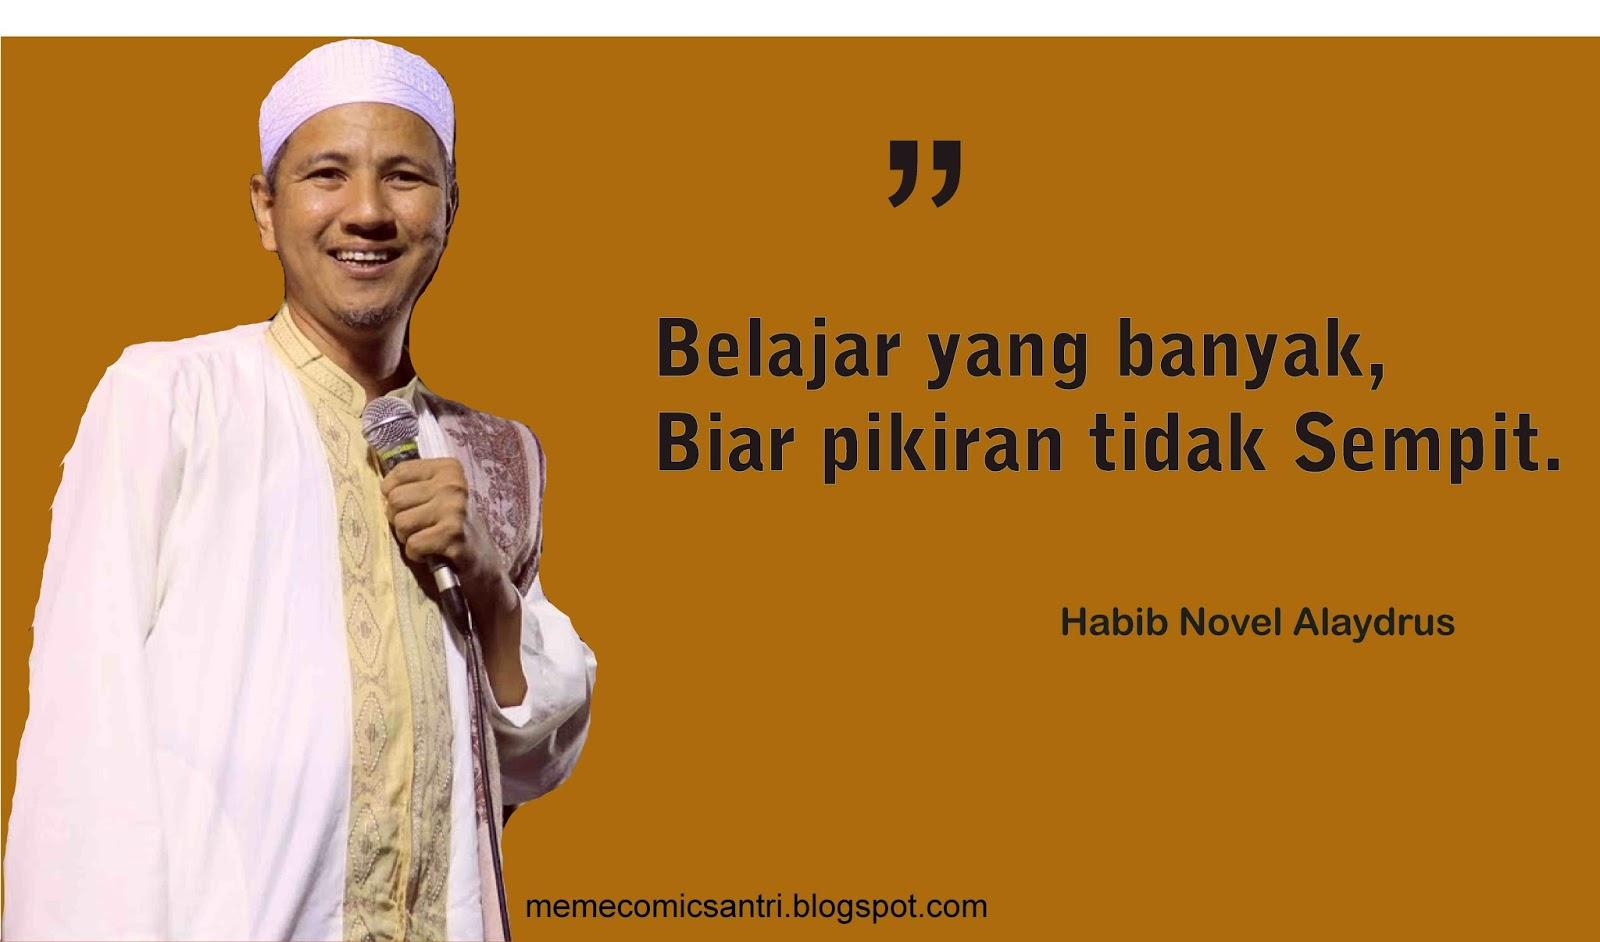 Kata Mutiara Nasehat Dari Habib Novel Alaydrus Tugas Troll